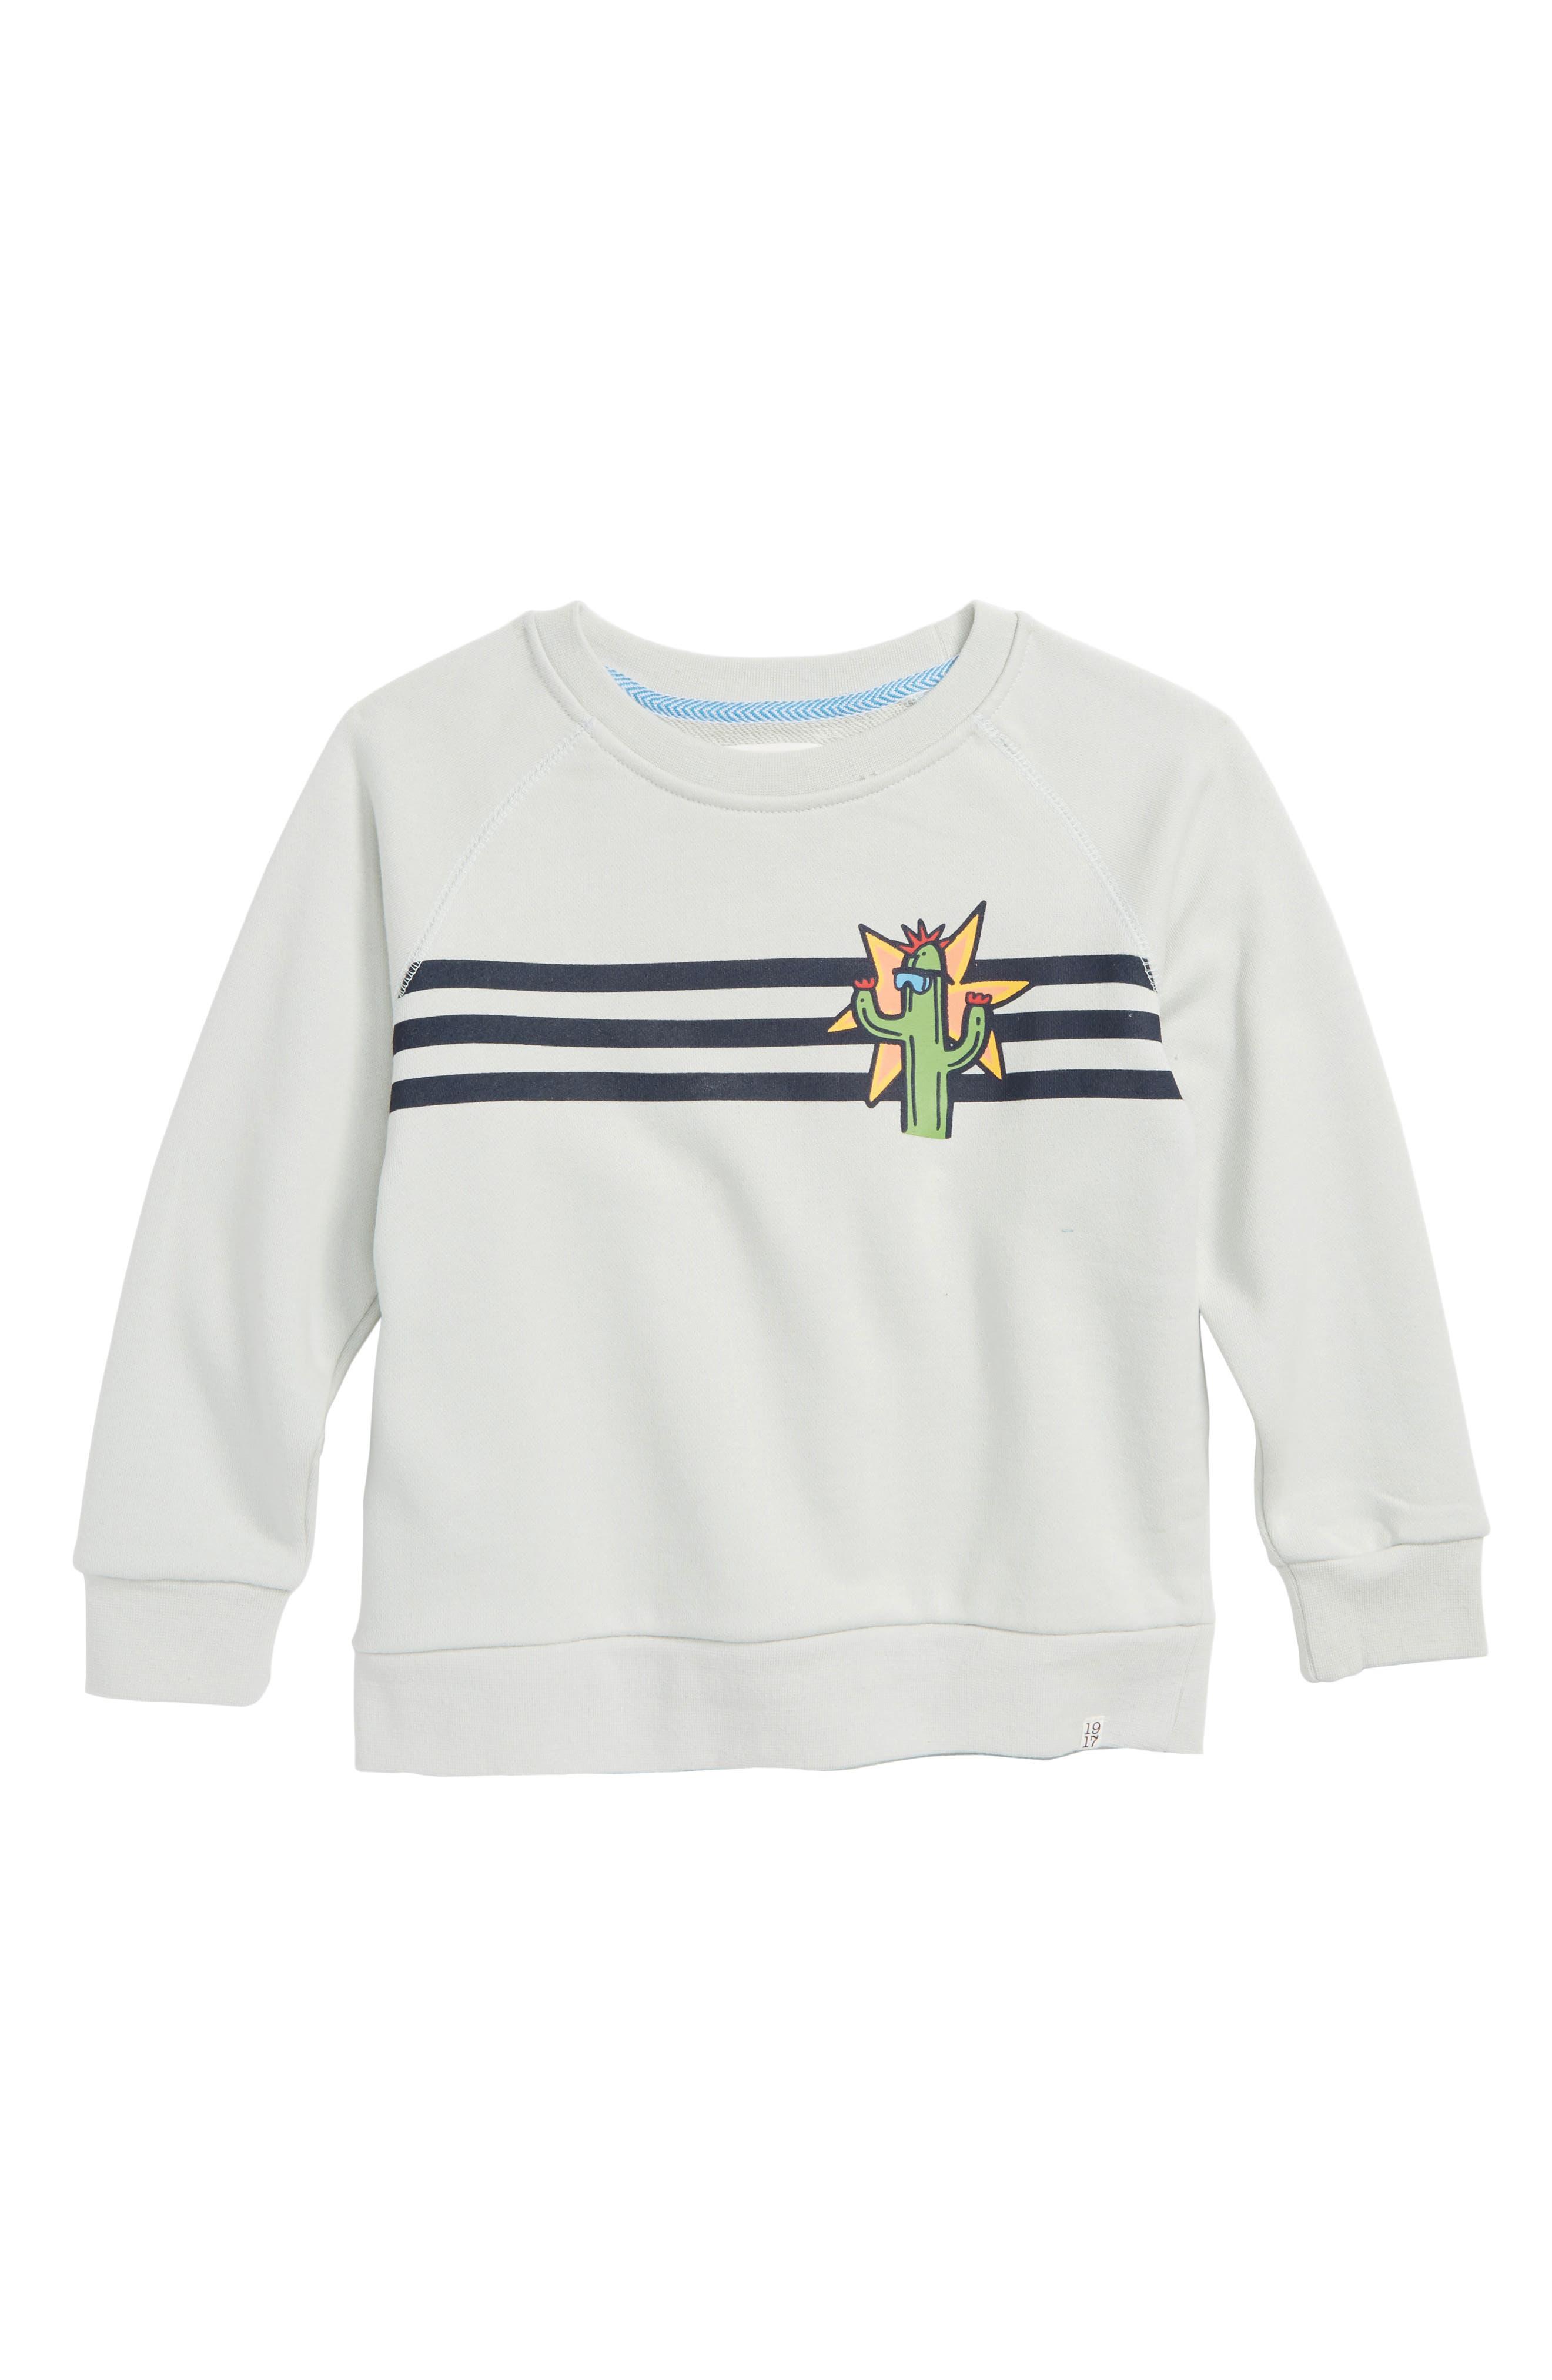 Collide T-Shirt,                         Main,                         color, SKY